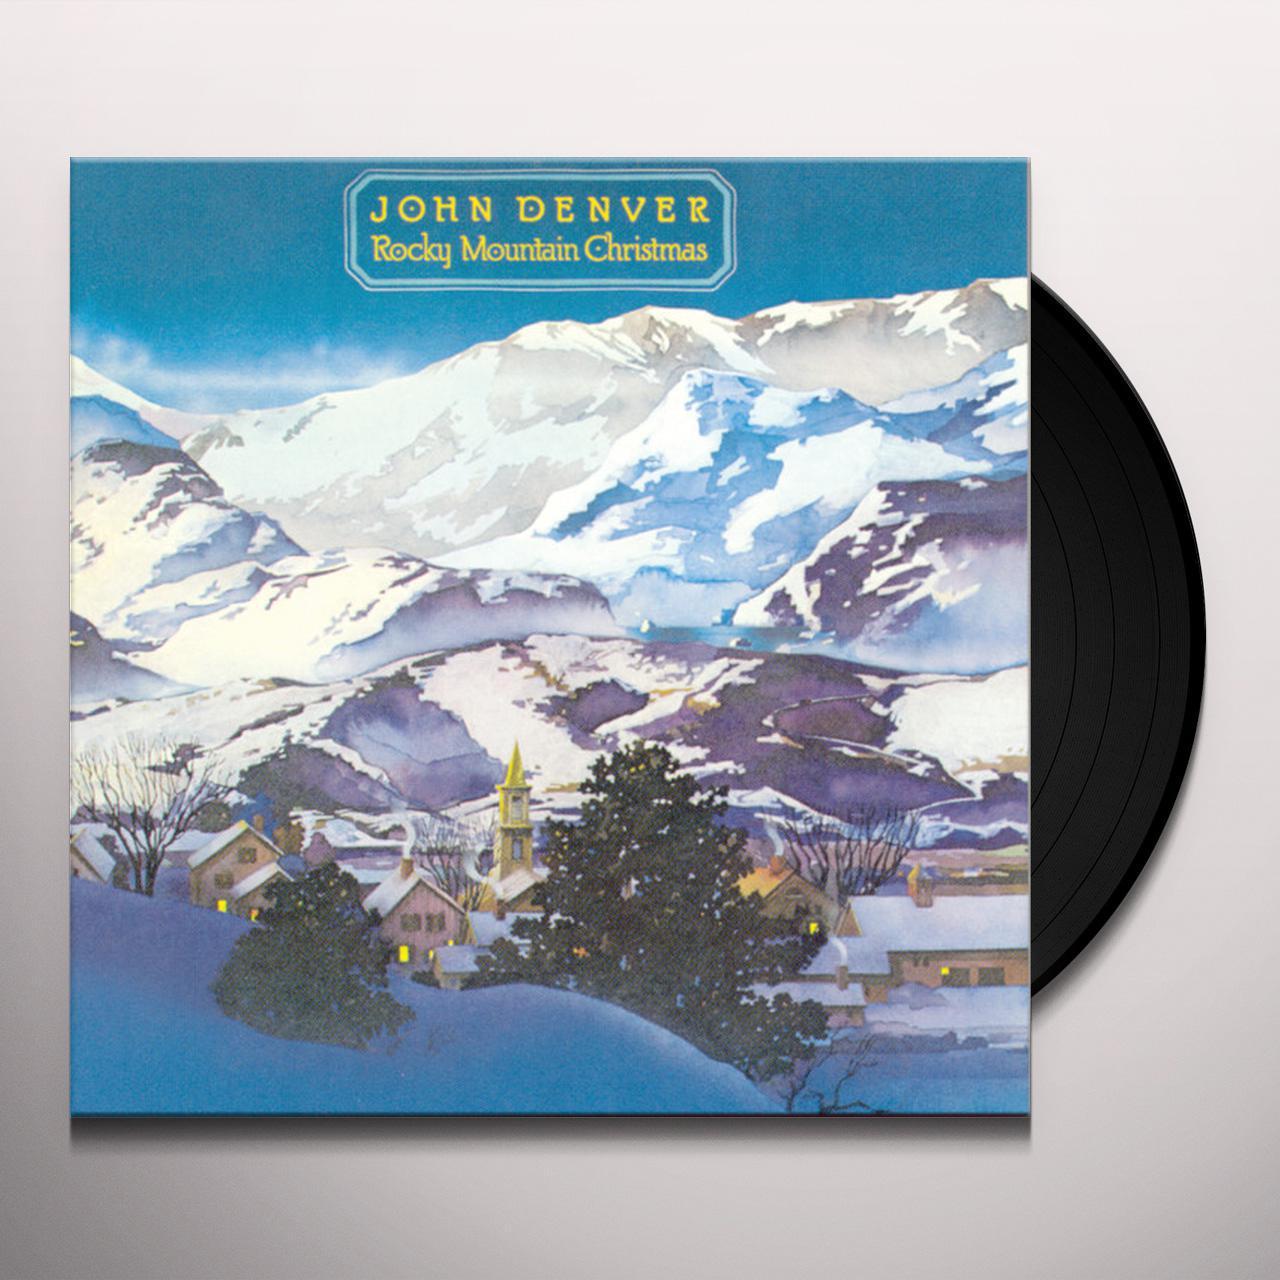 john denver rocky mountain christmas vinyl record tap to expand - John Denver Rocky Mountain Christmas